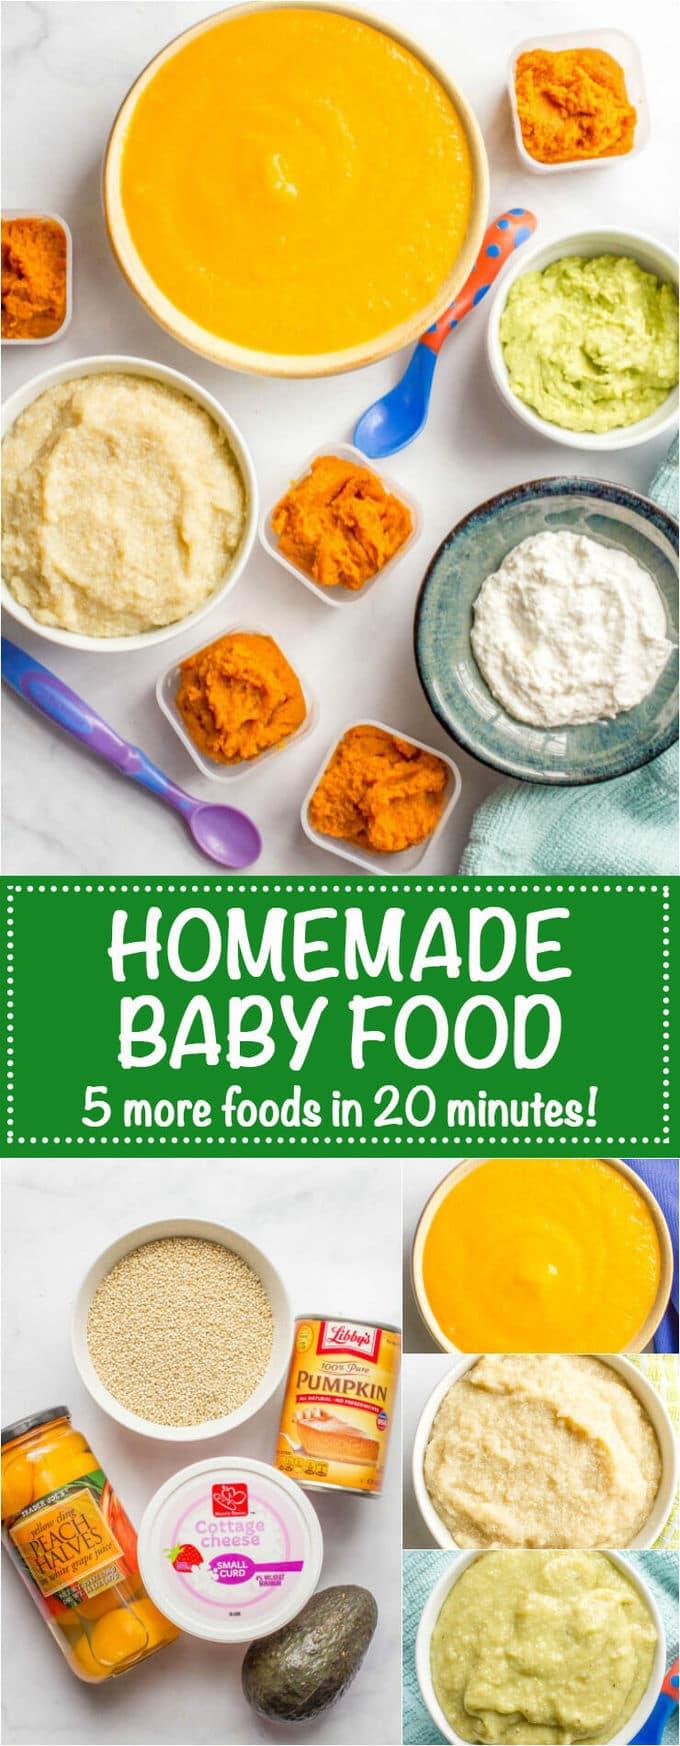 Homemade Baby Food Quinoa Peaches Avocado Pumpkin And